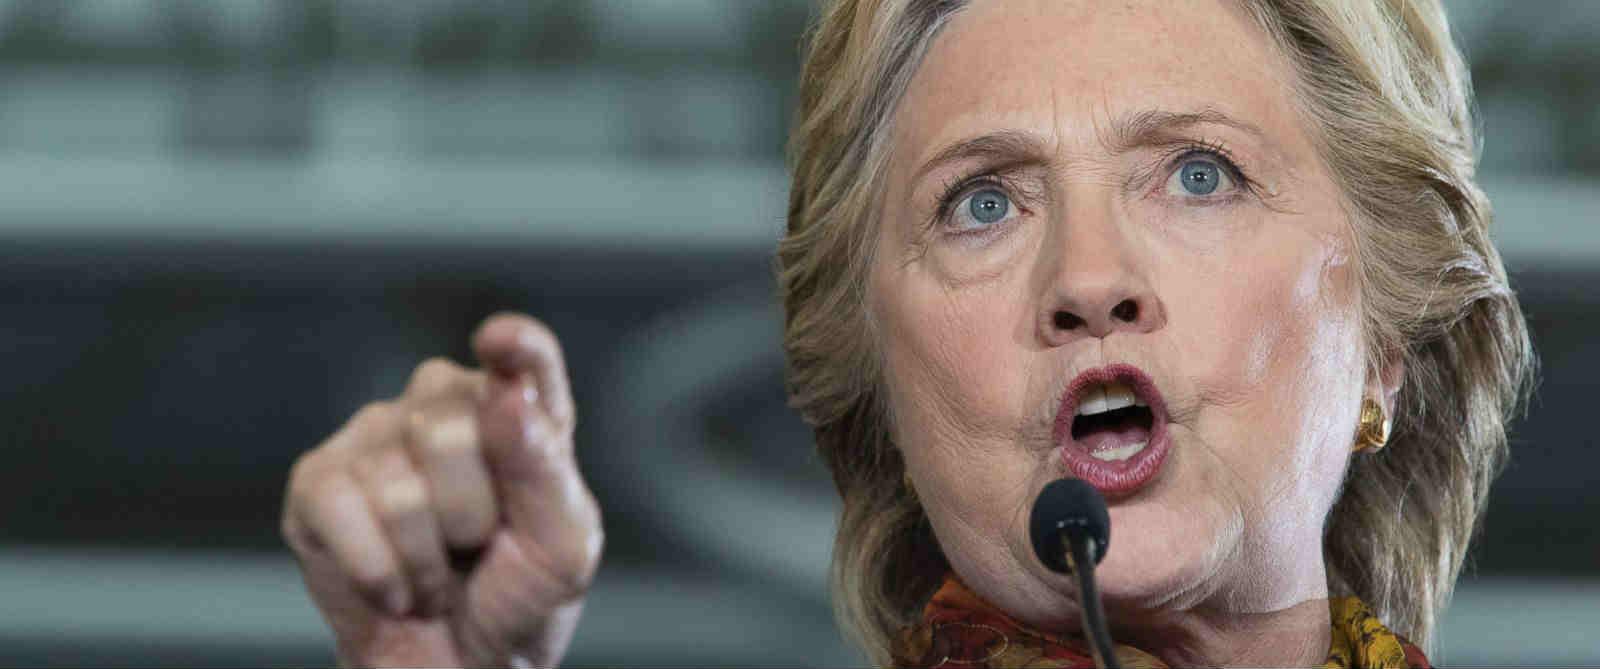 Clinton Fires Back at Trump's Gettysburg Address